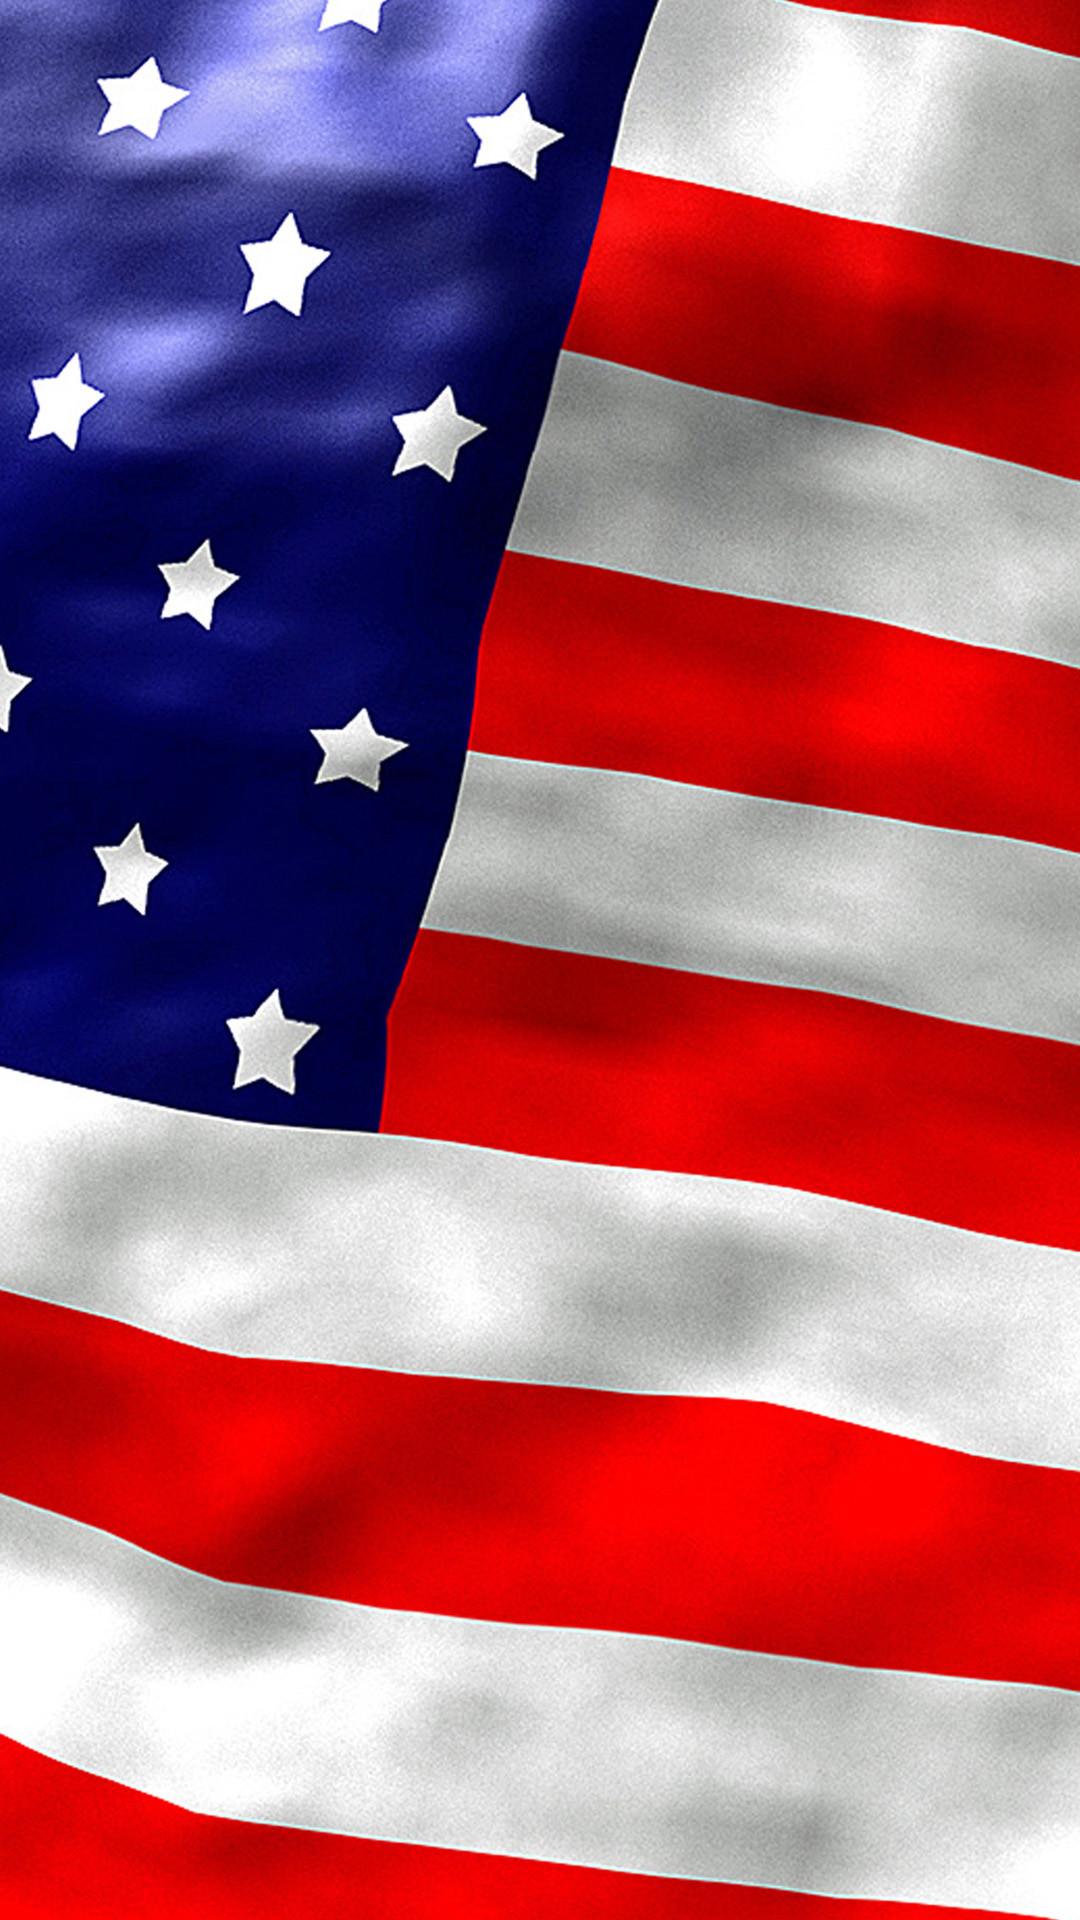 American Flag 2 Wallpapers